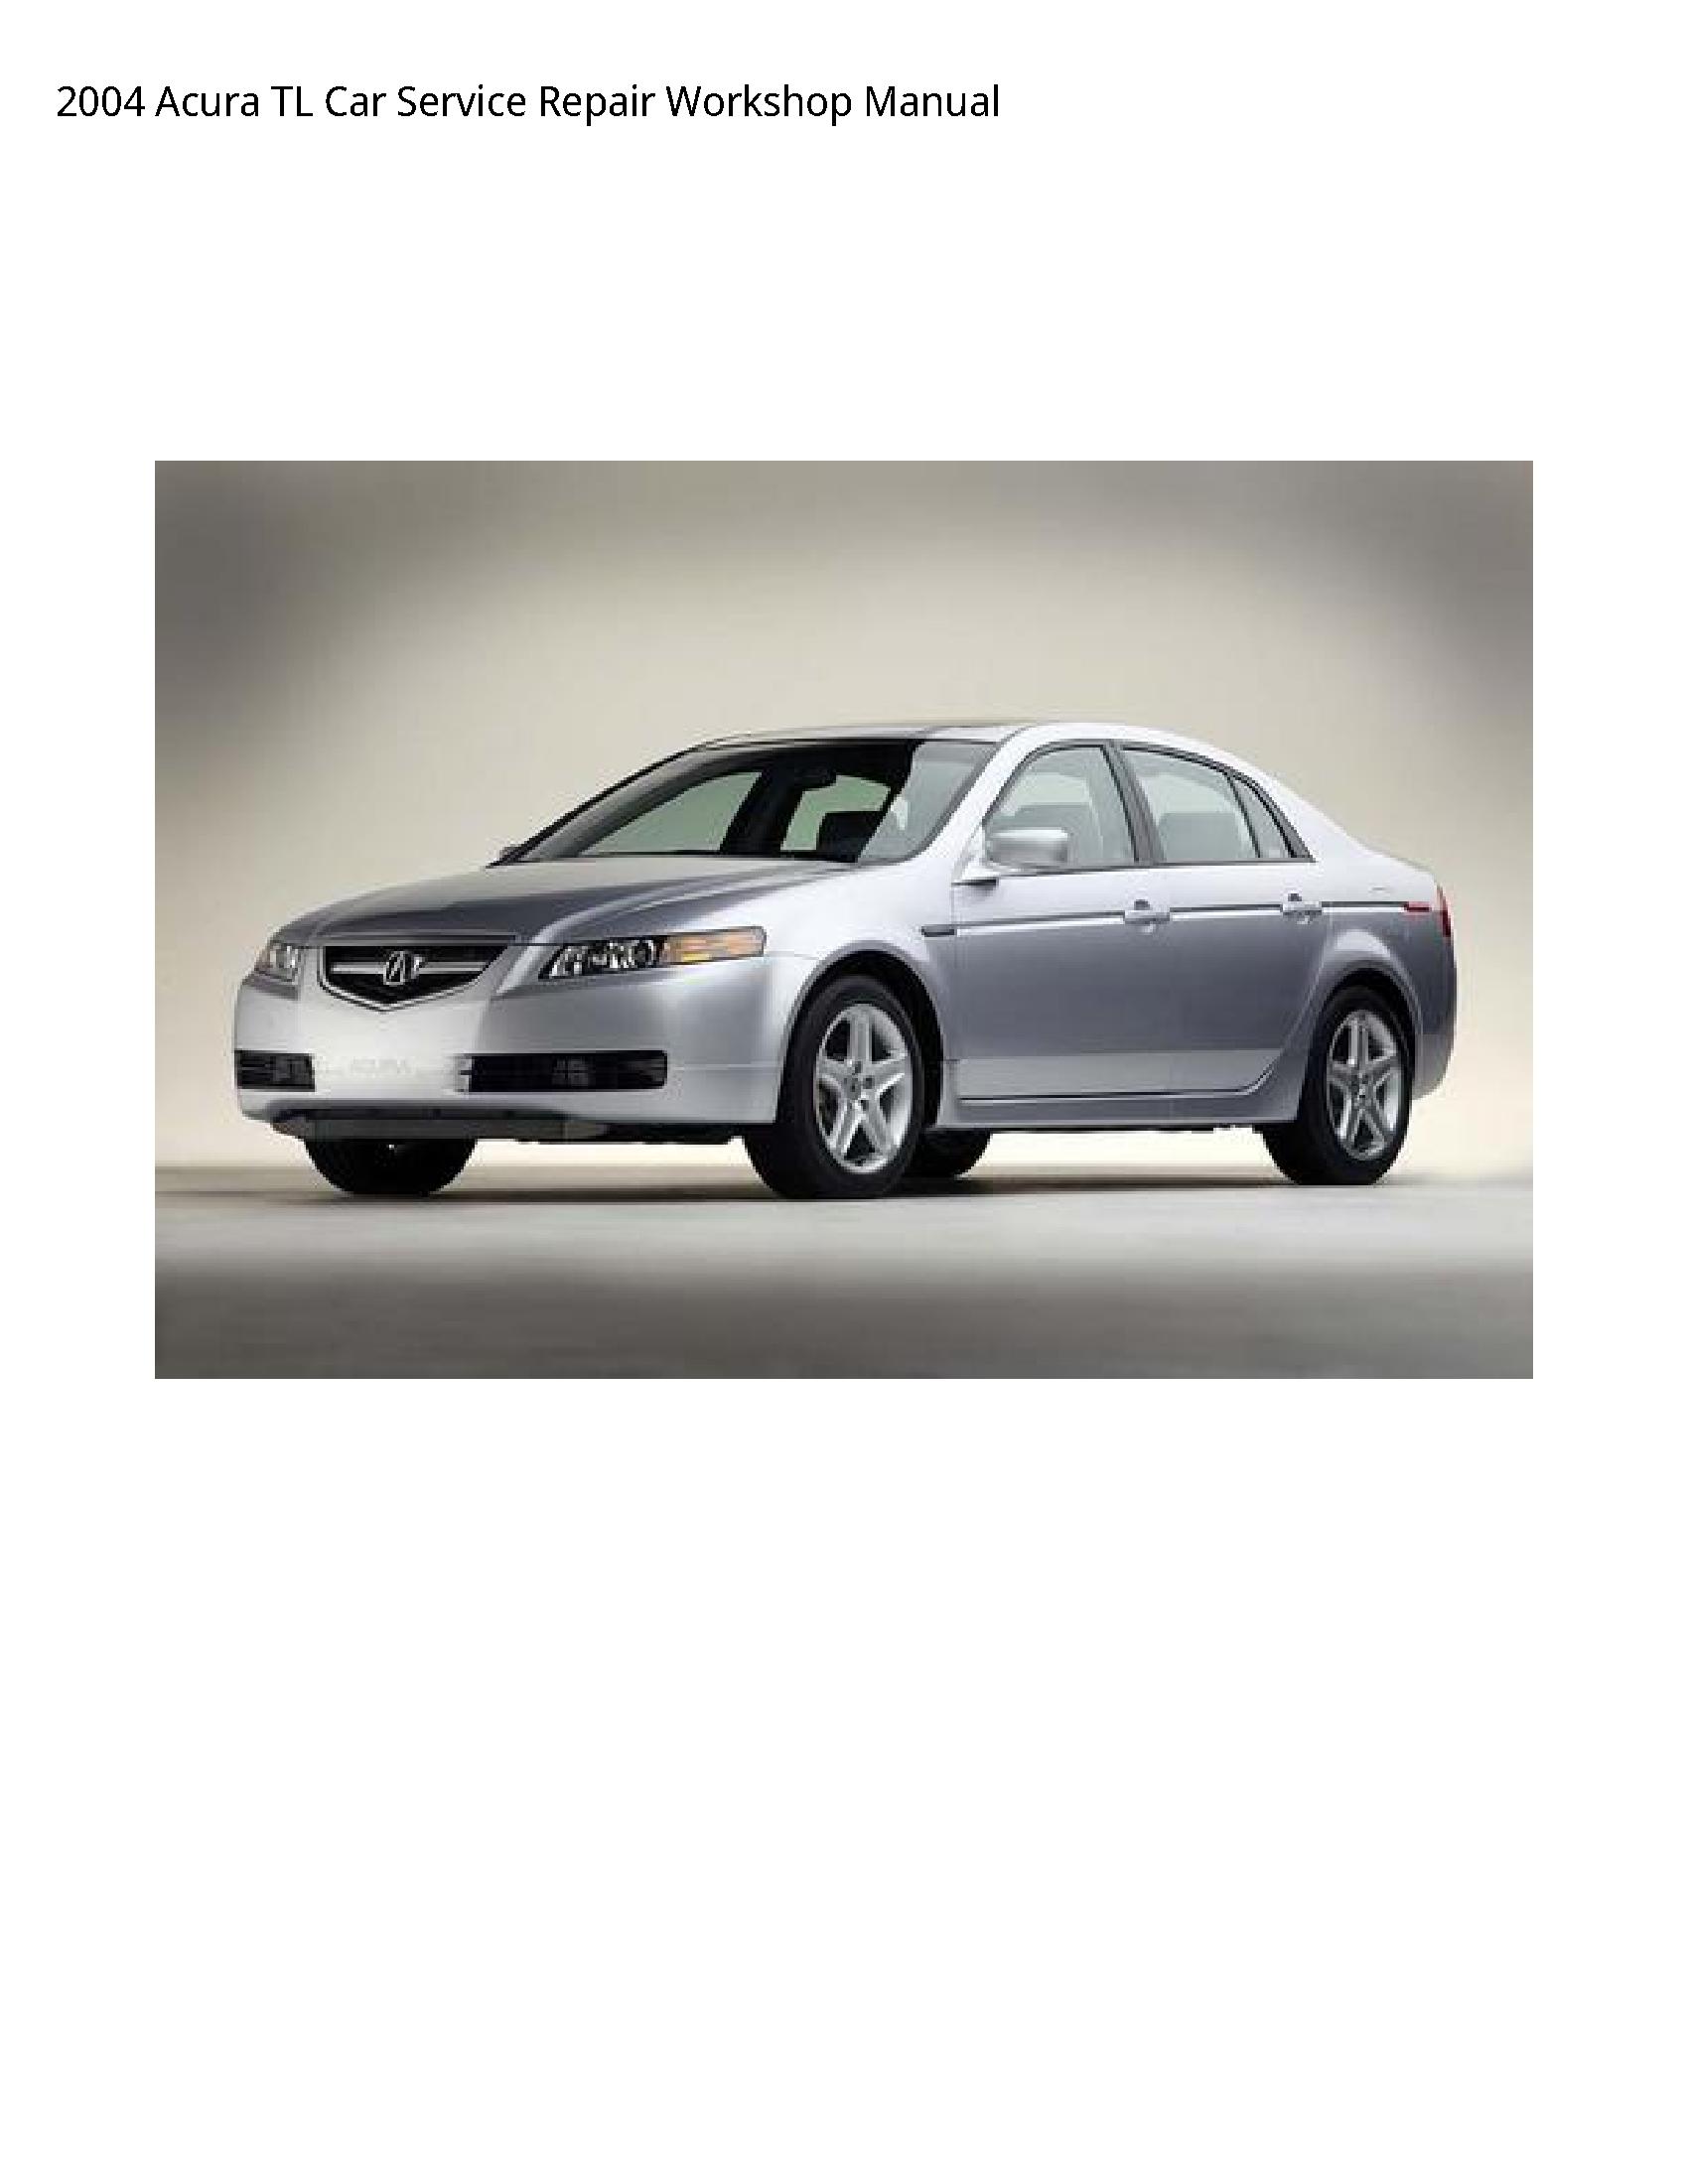 Acura TL Car manual